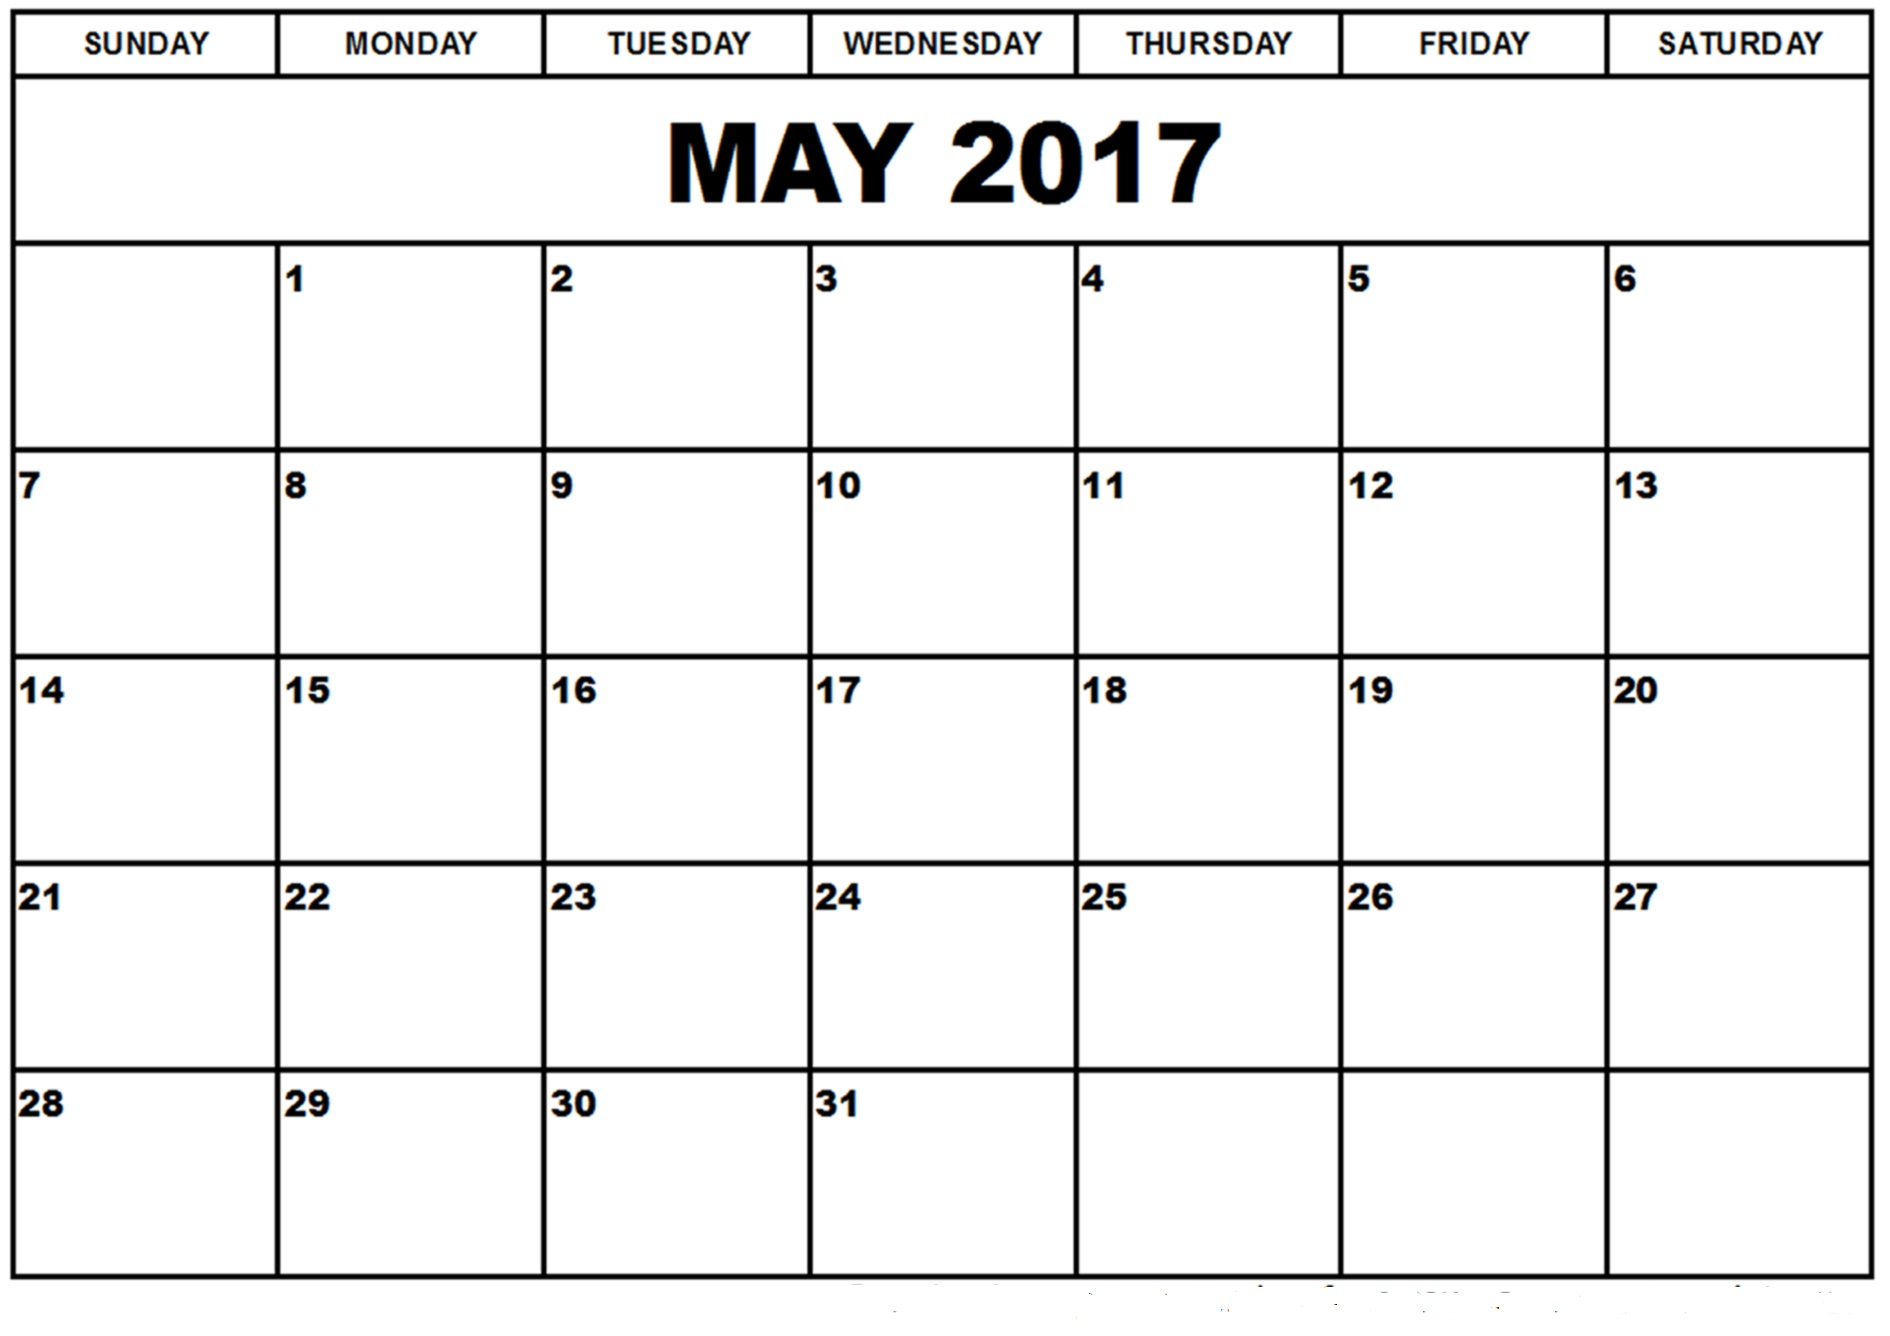 May 2017 calendar | May 2017 calendar printable